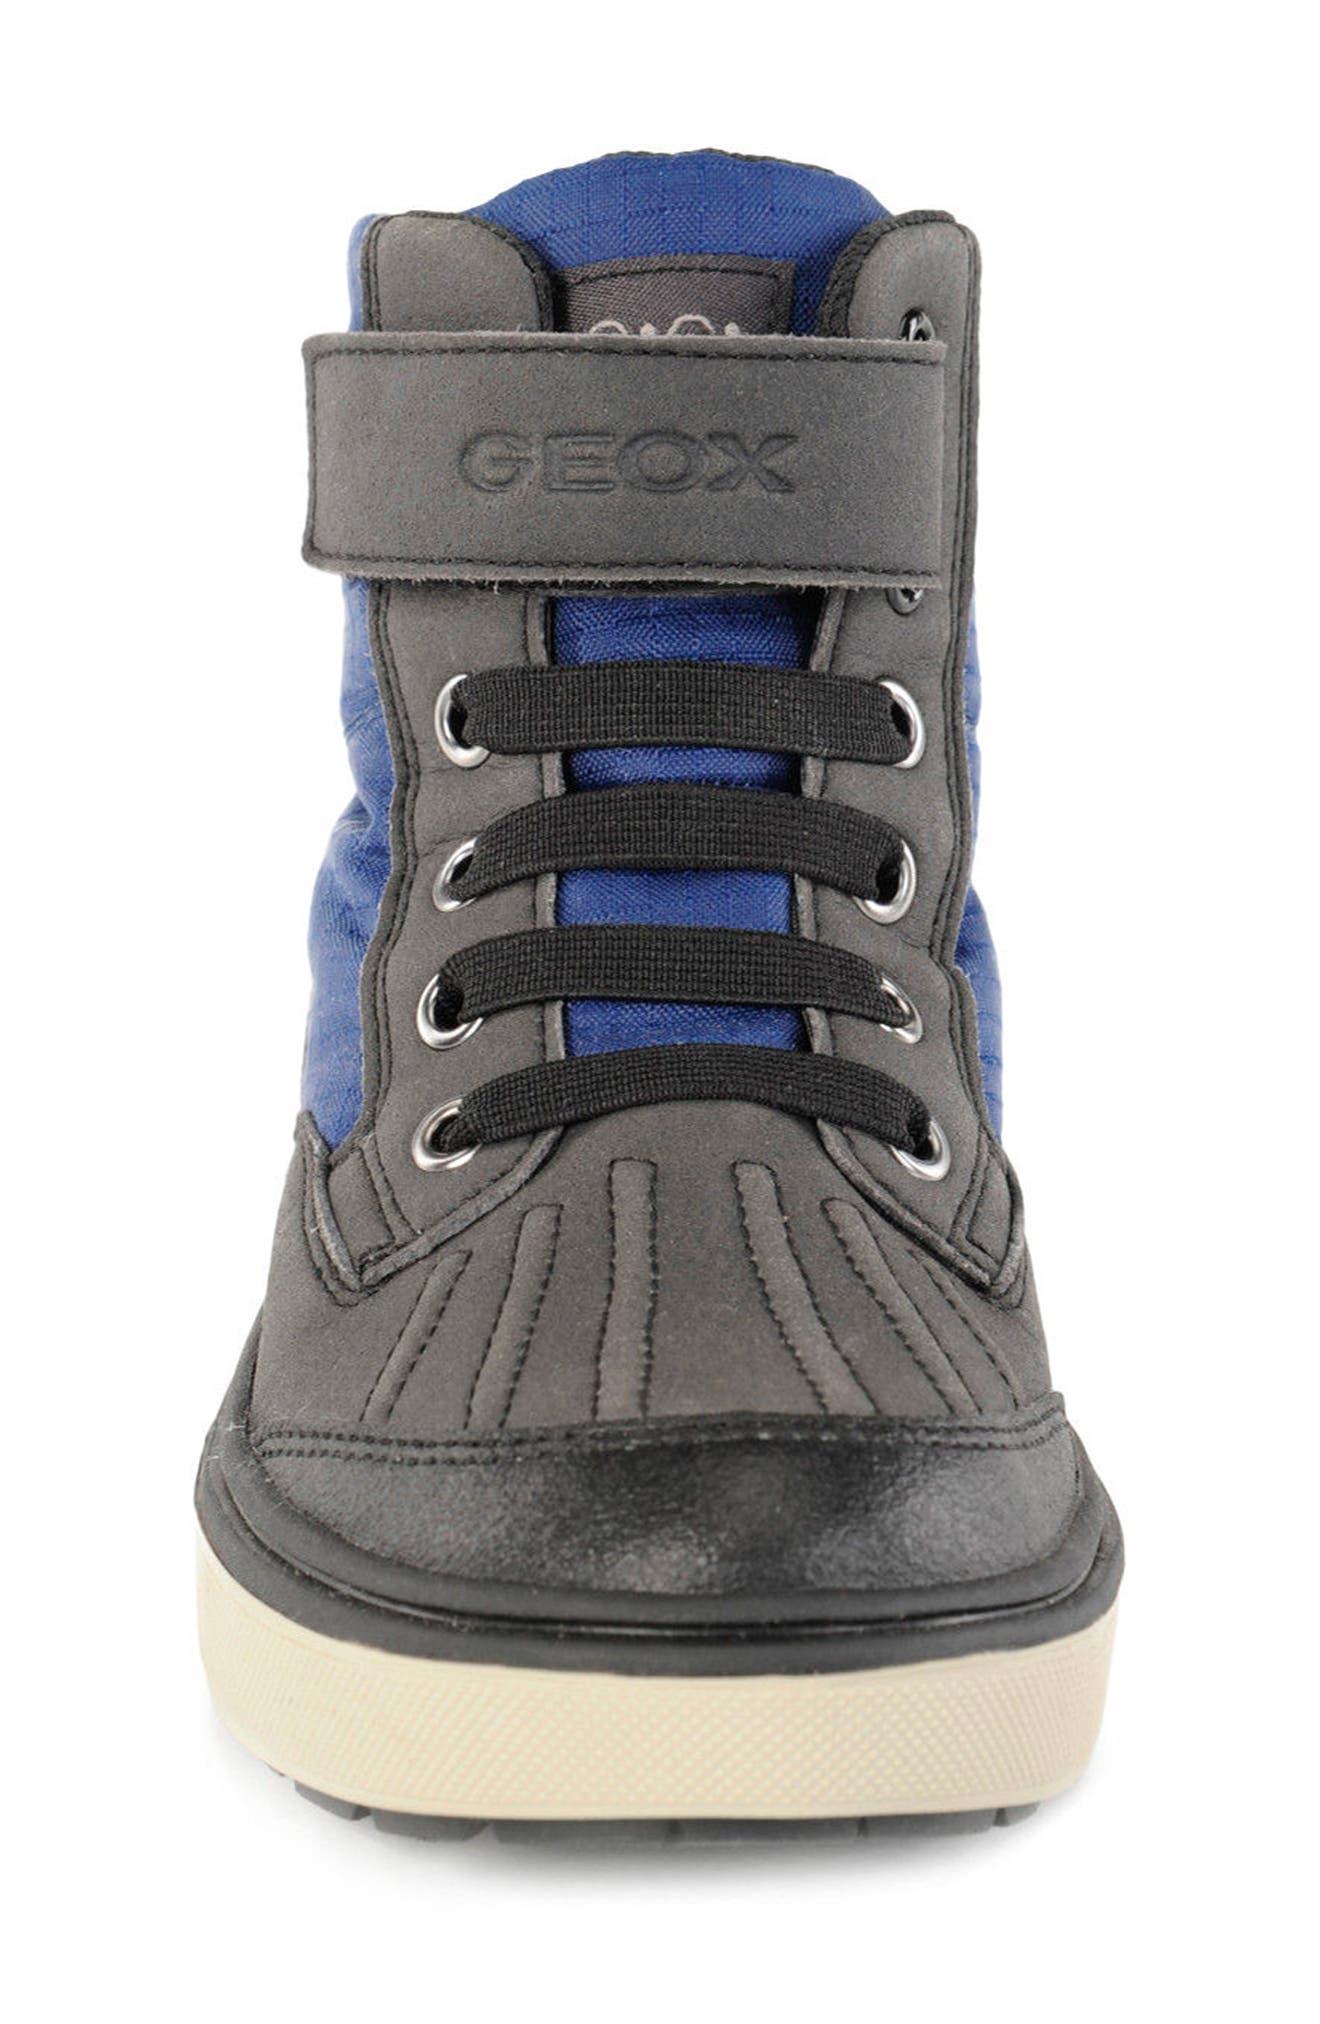 Alternate Image 4  - Geox 'Mattias - ABX' Amphibiox® Waterproof Sneaker (Toddler, Little Kid & Big Kid)